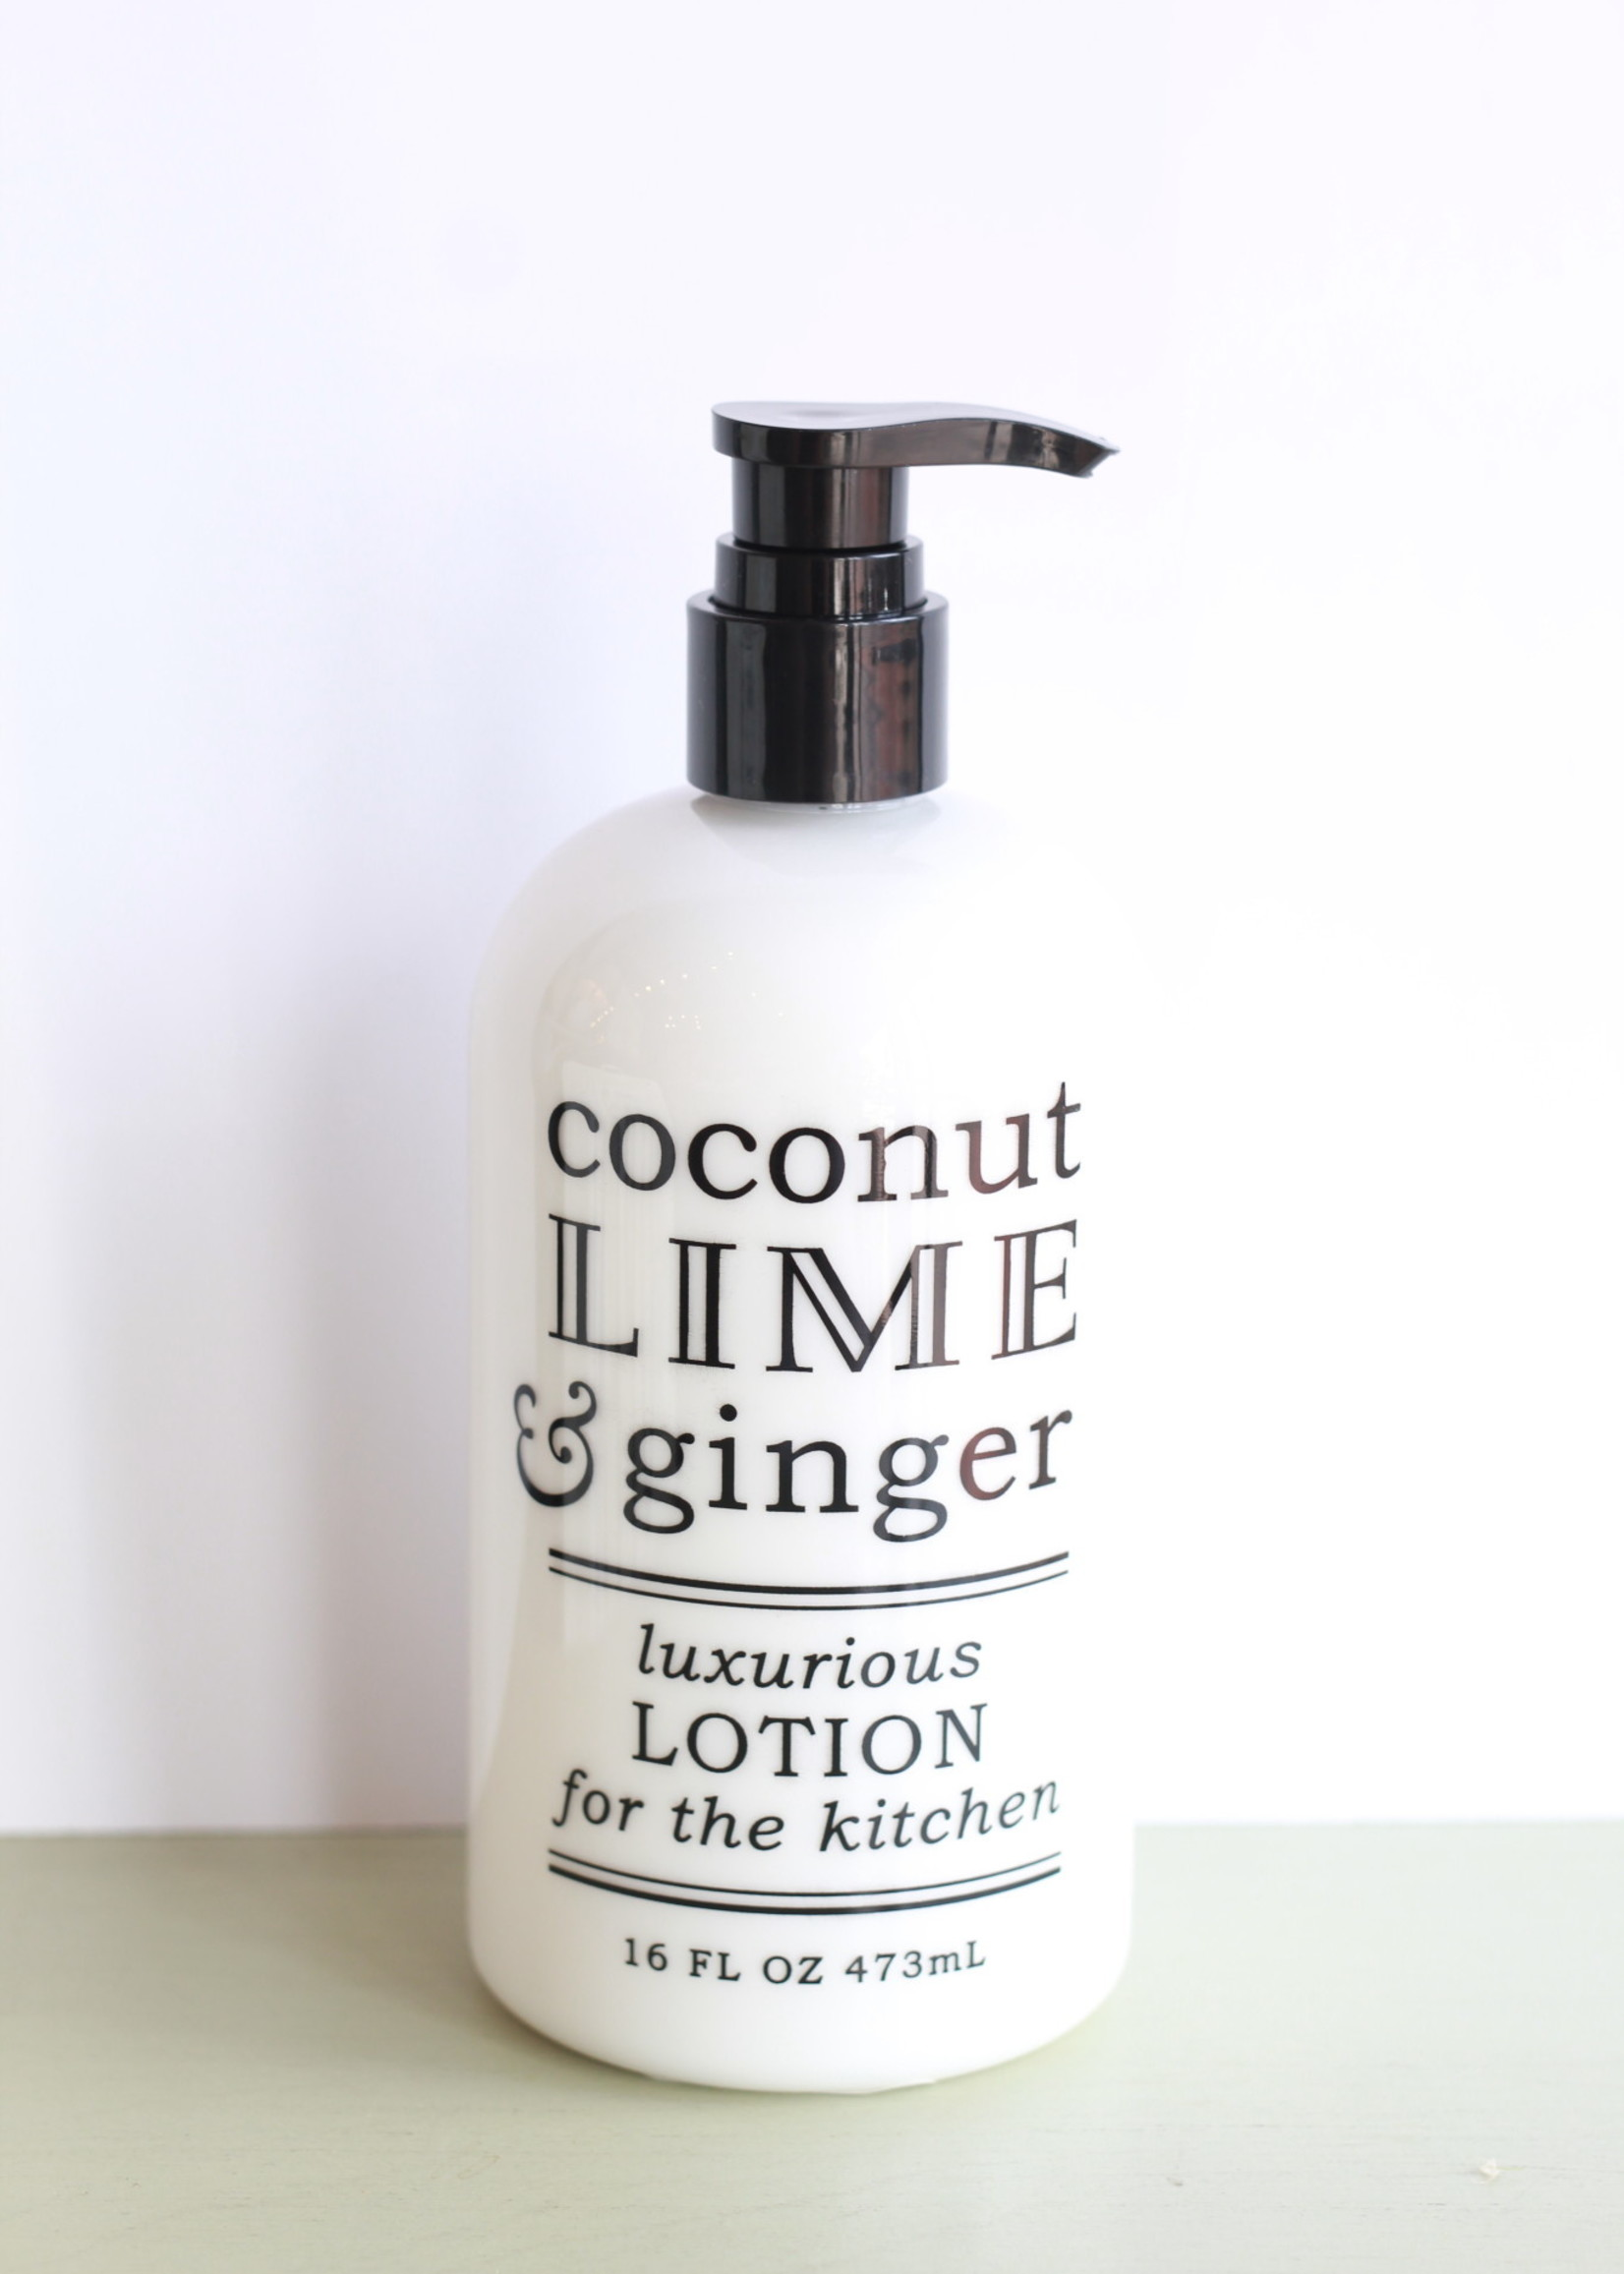 GBTC Coconut Lime & Ginger Lotion